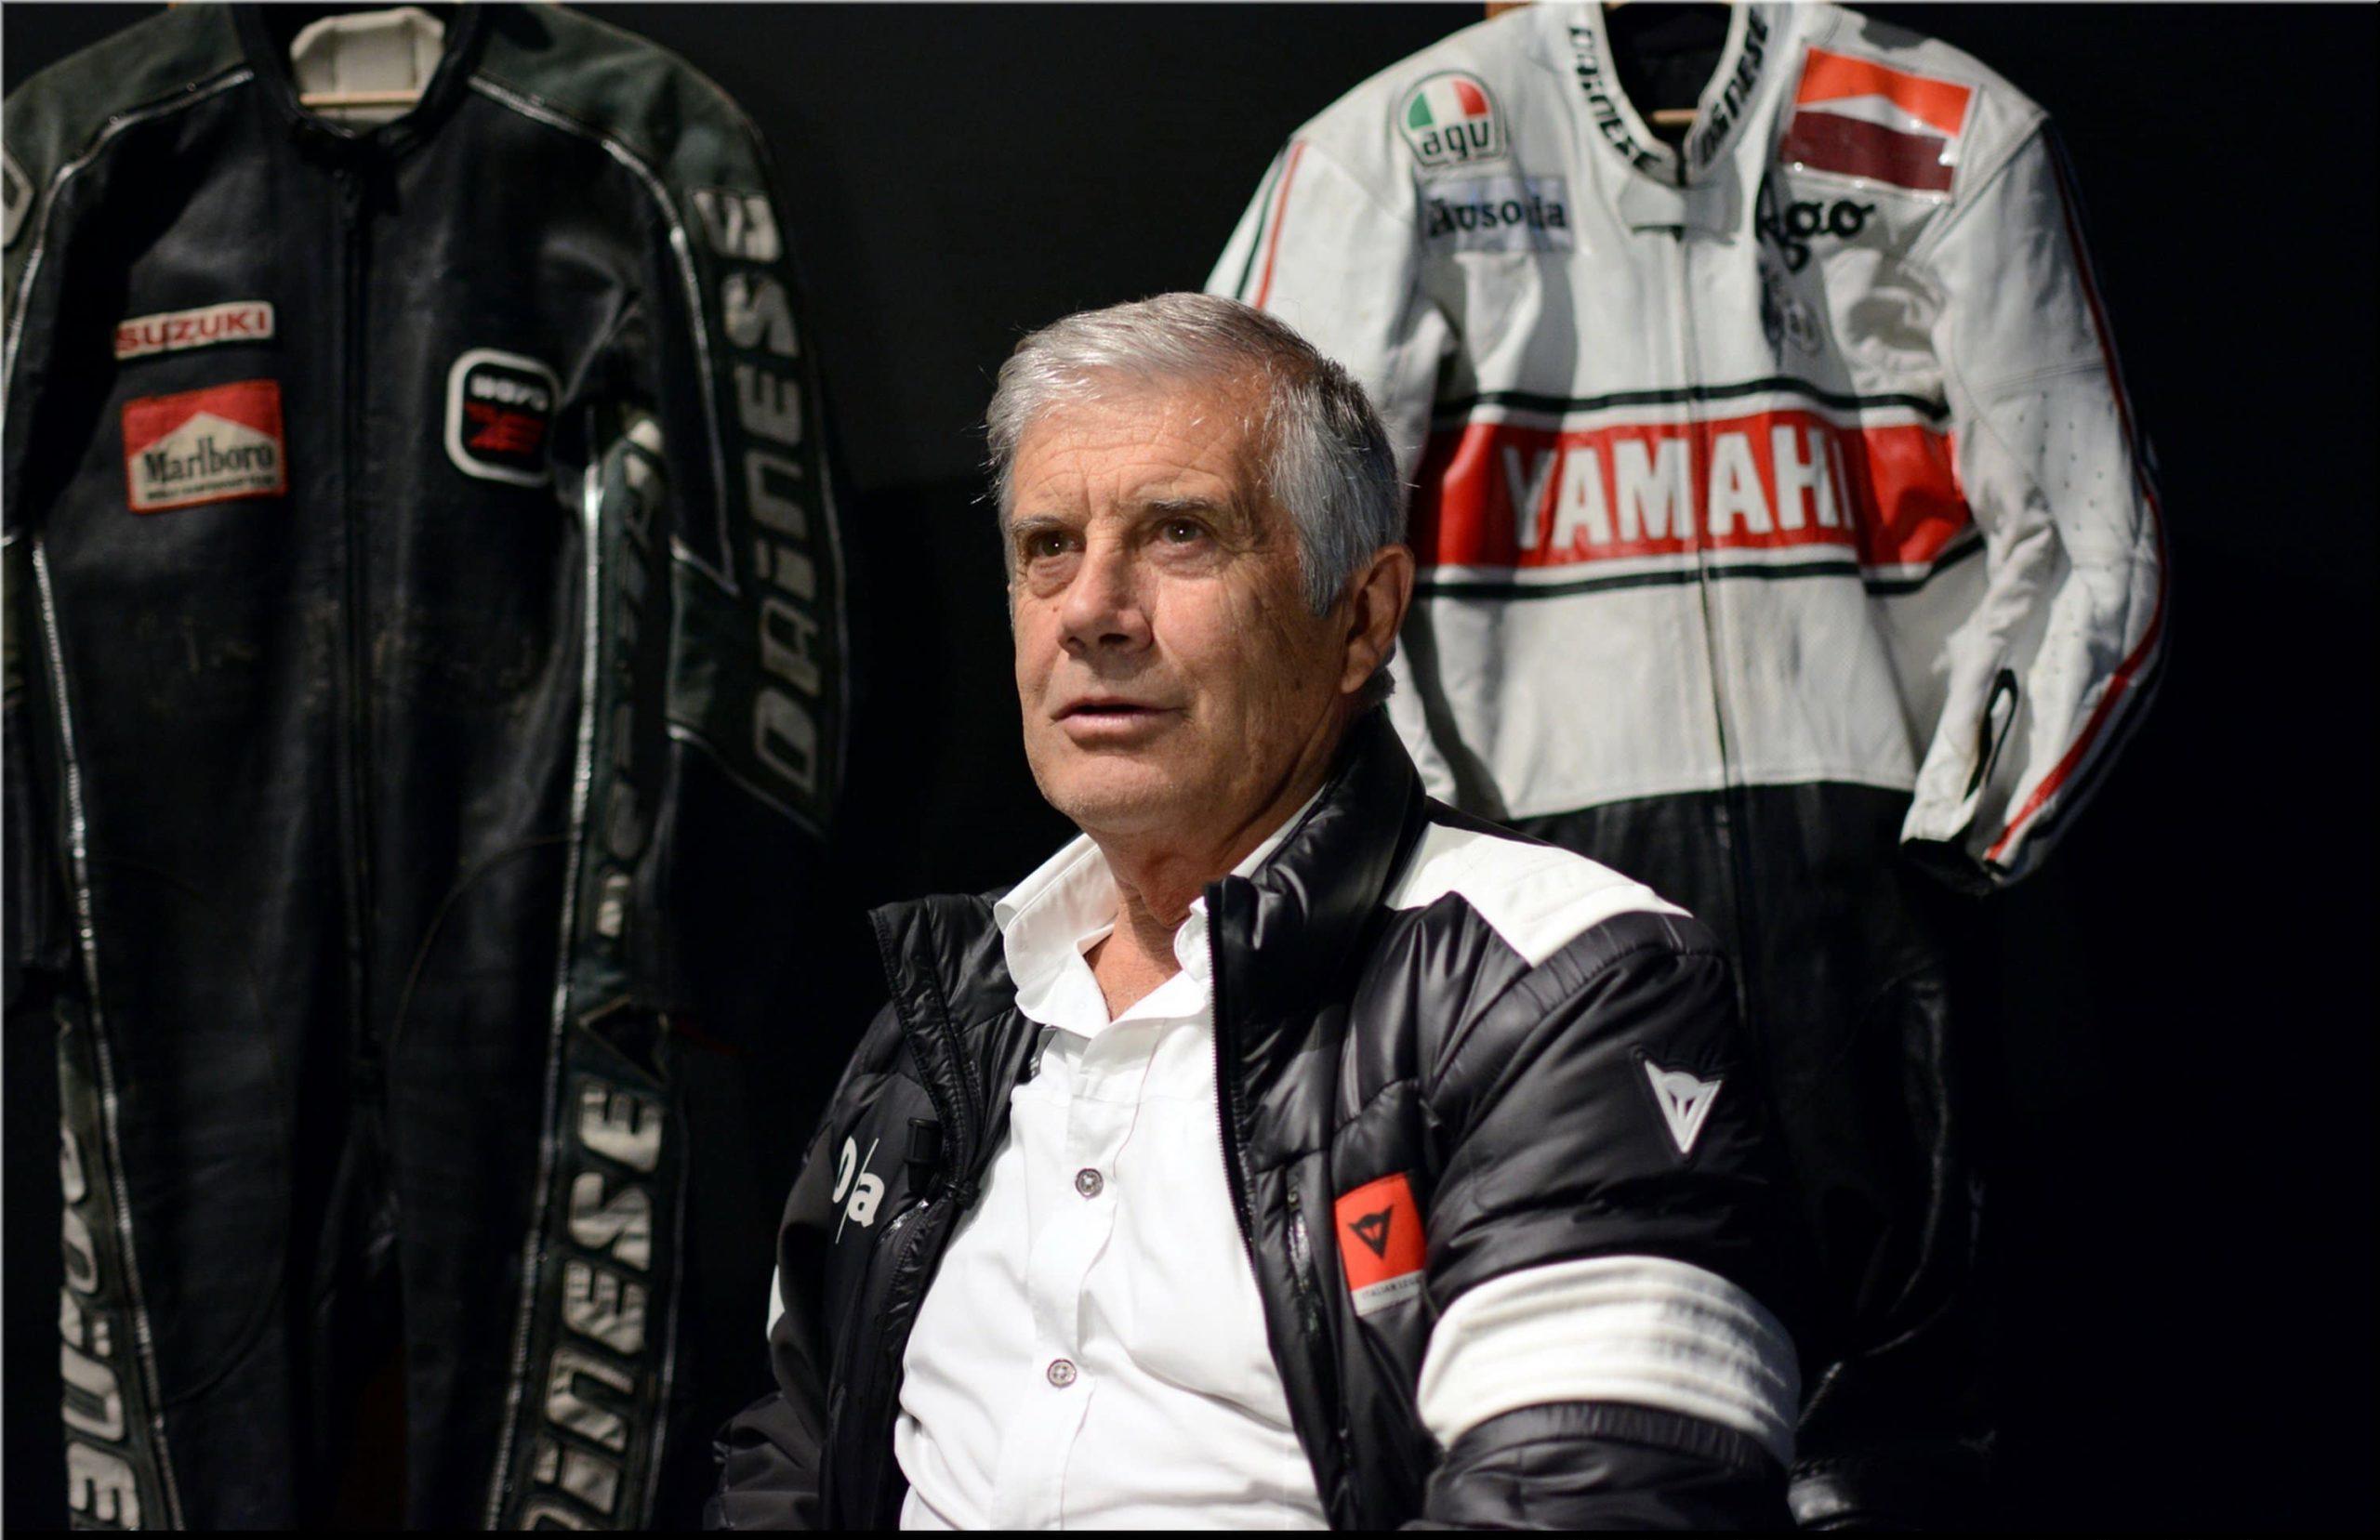 Giacomo Agostini en combi et autres équipements moto Dainese